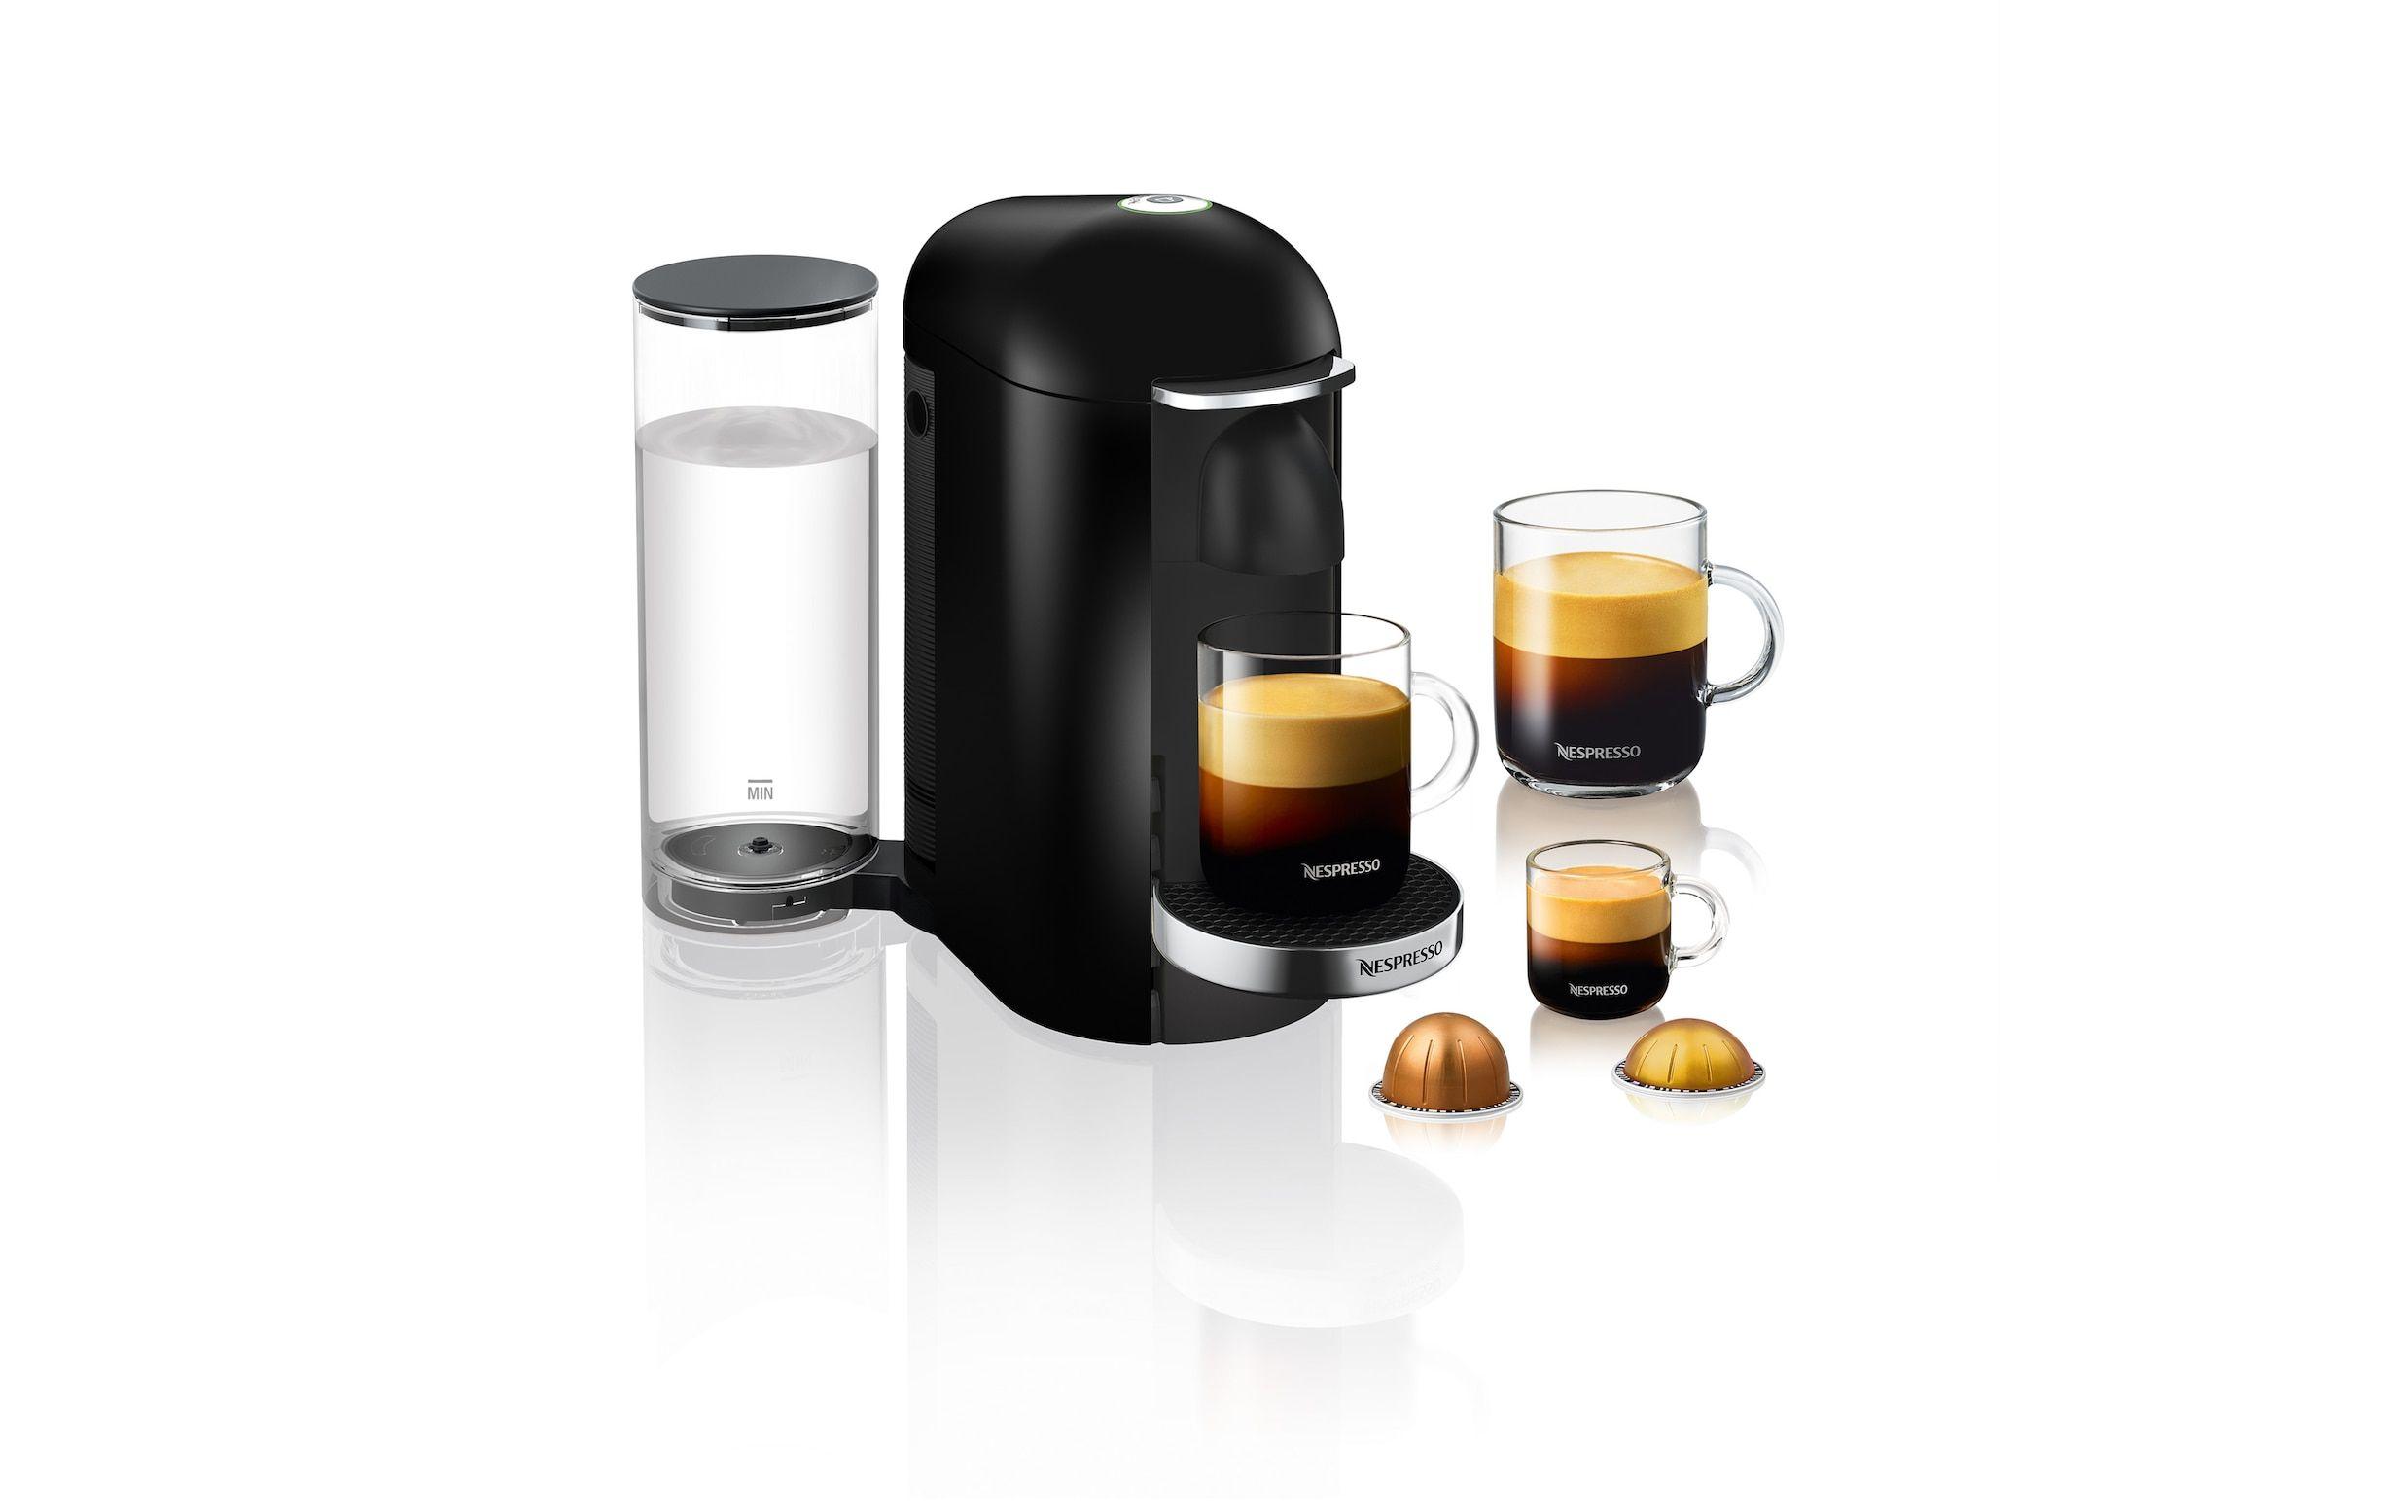 VertuoPlus Deluxe Black Vertuo Coffee Machine